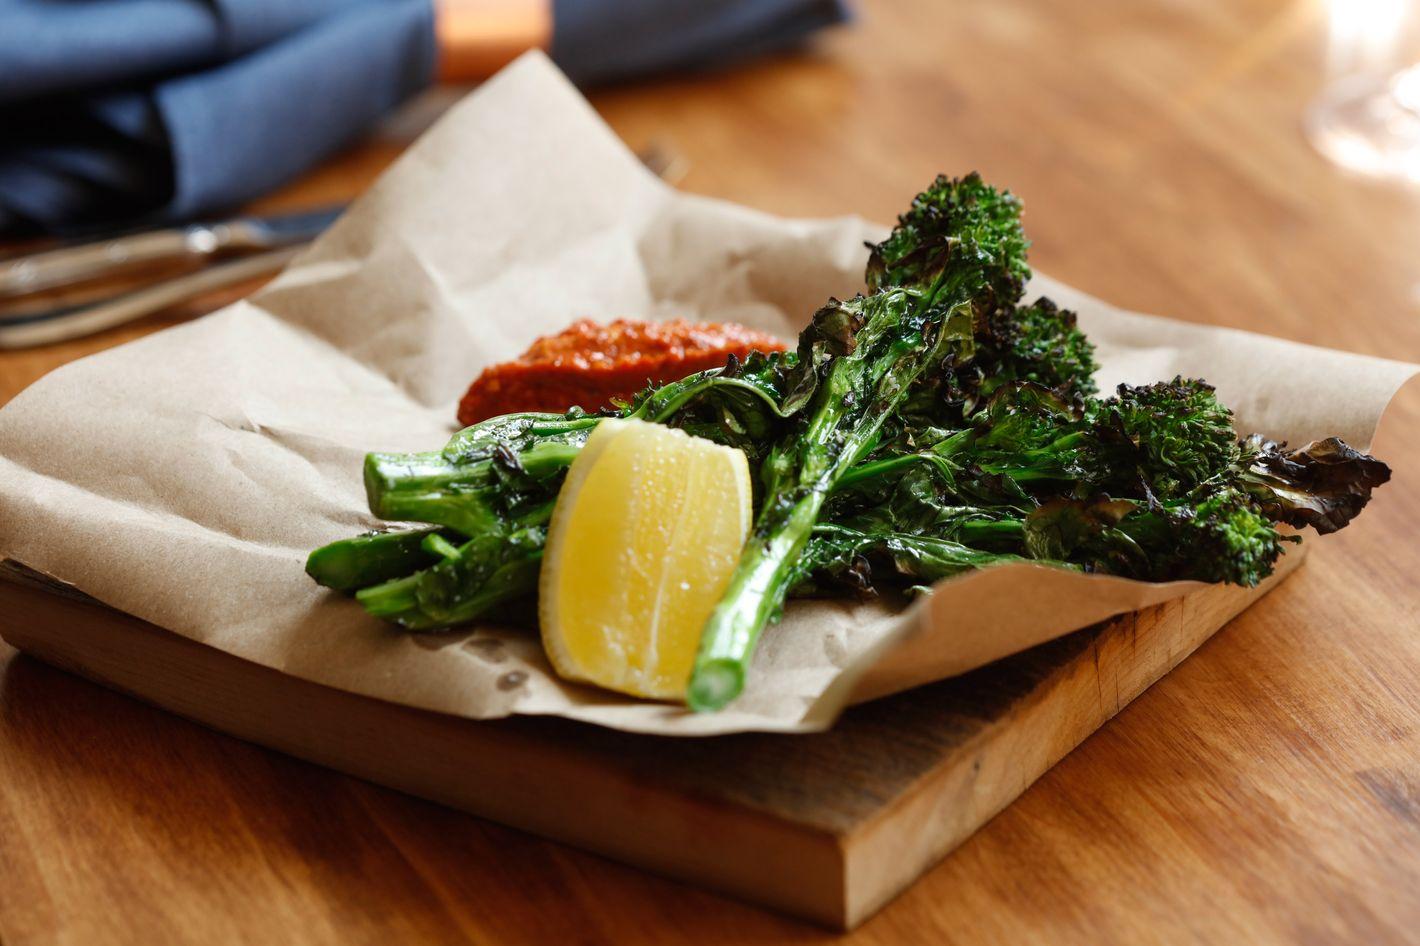 Grilled broccoli rabe with romesco. Photo: Melissa Hom